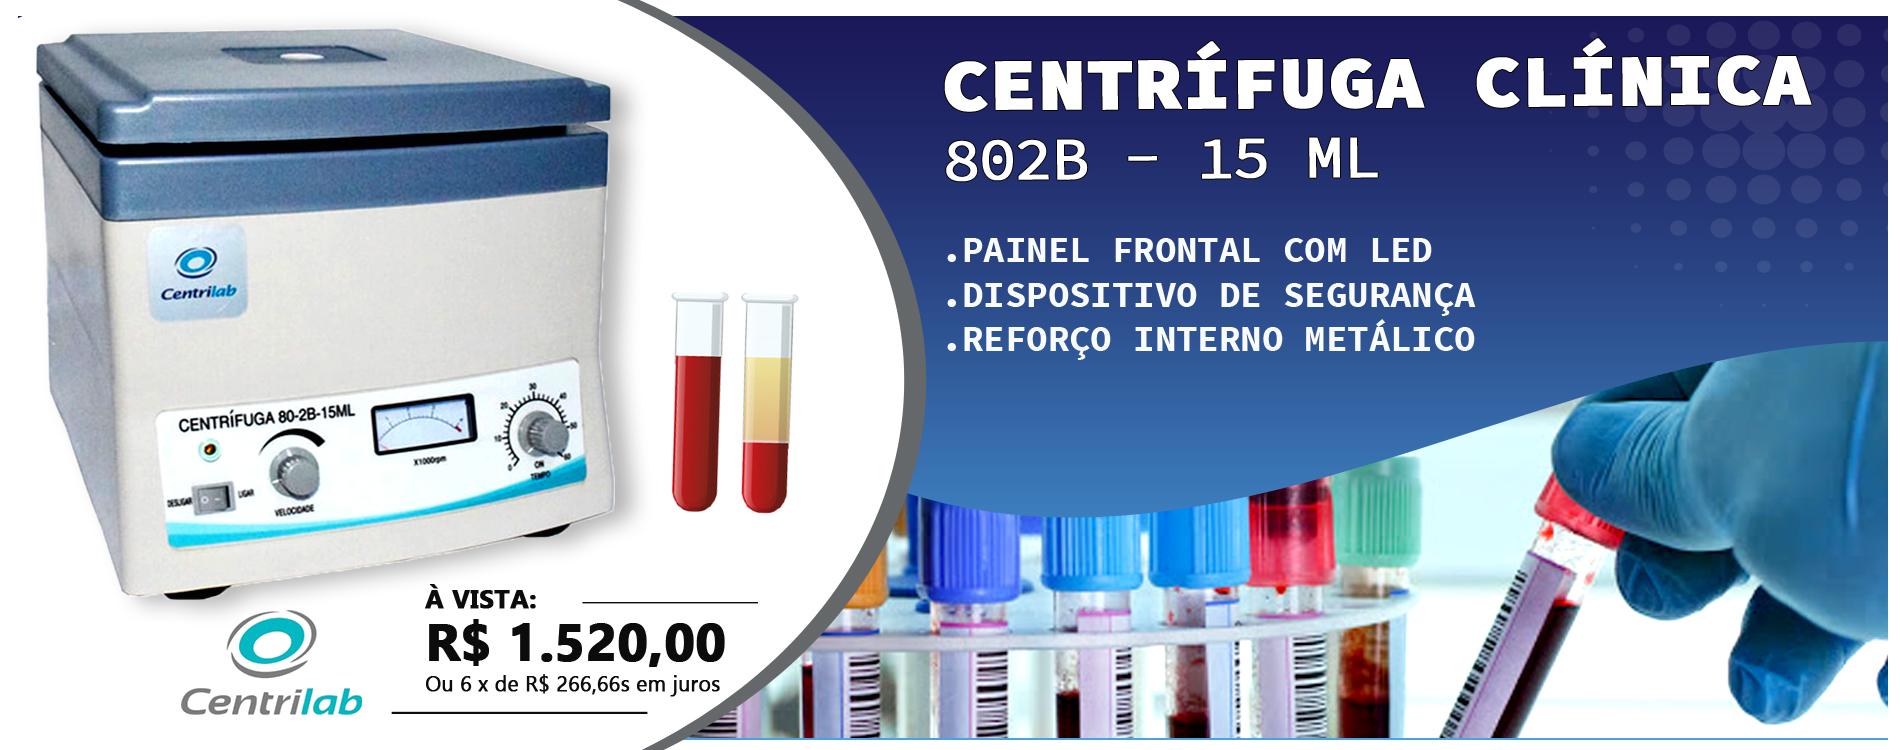 centrifuga Clinica